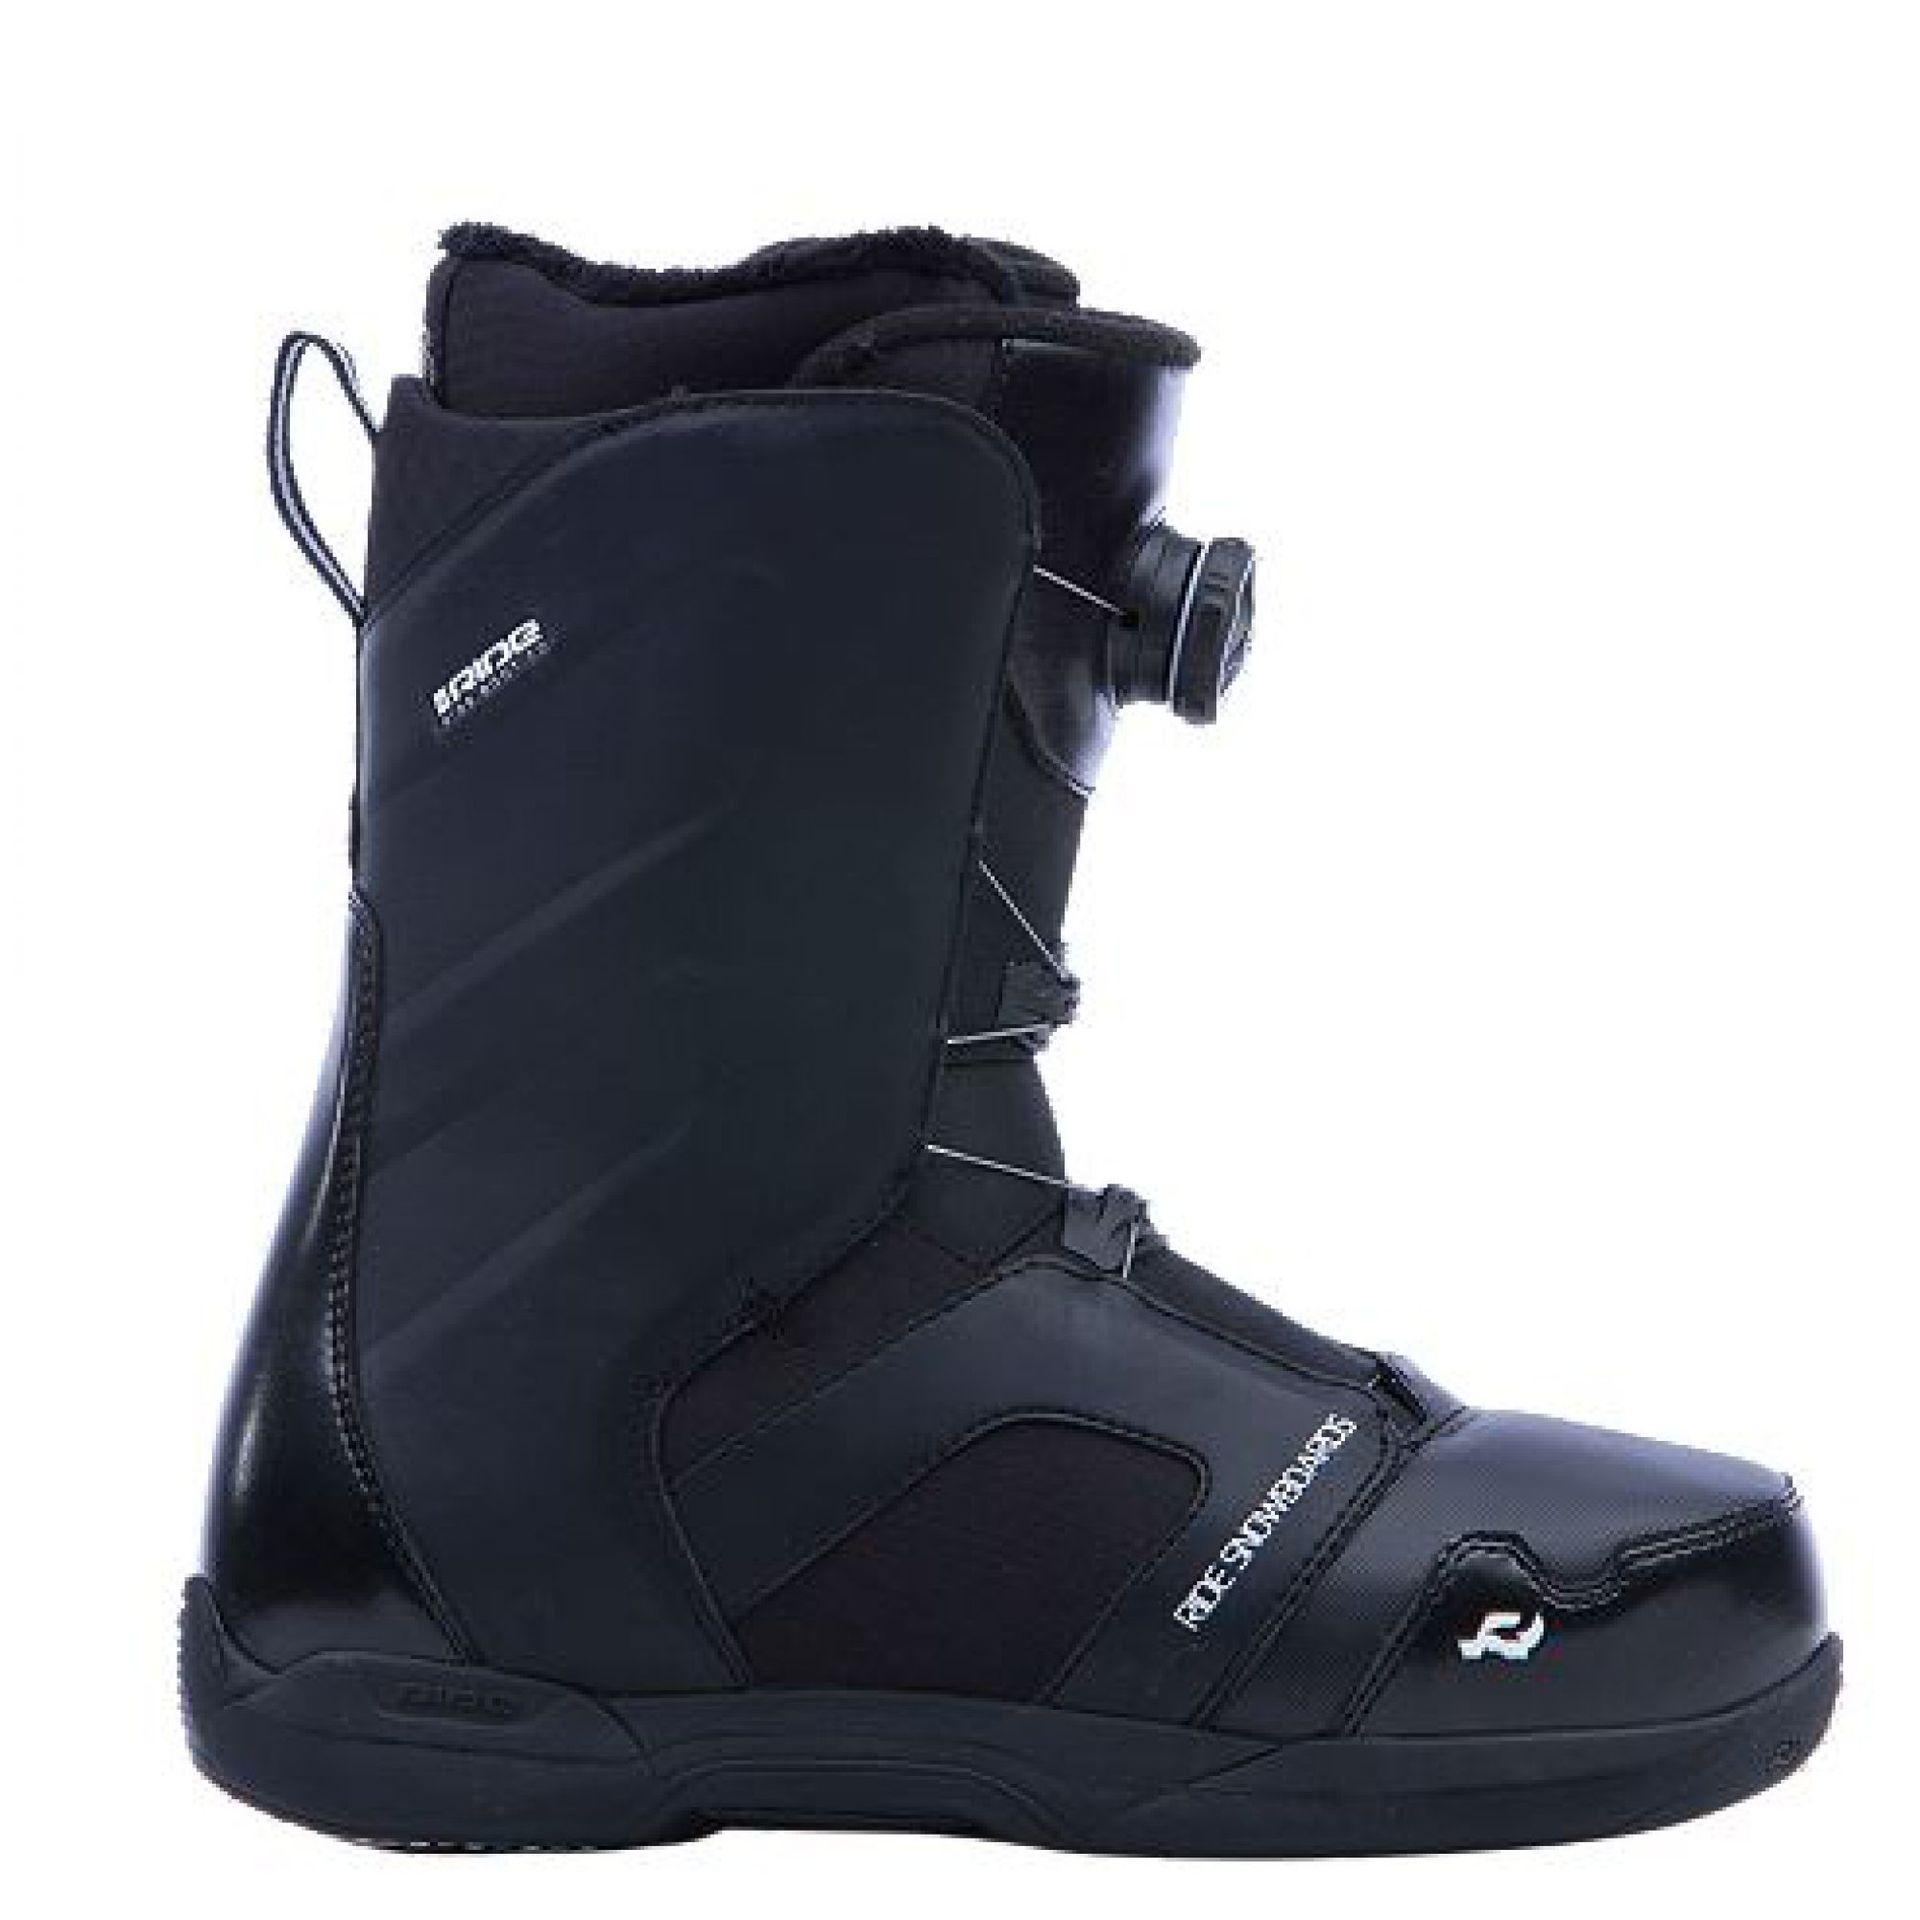 Buty snowboardowe Ride Rook Boa czarny